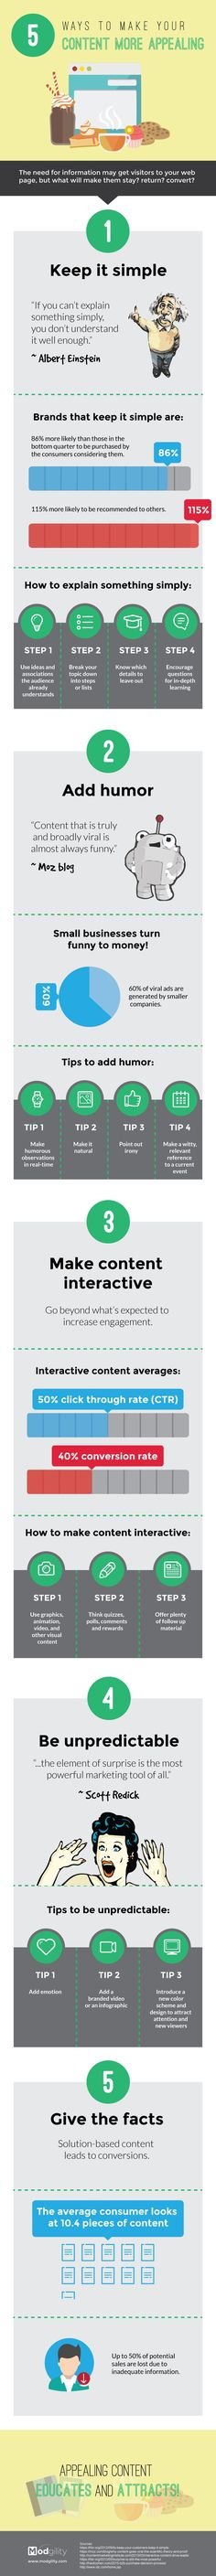 Content marketing tips Content Marketing Strategy, Inbound Marketing, Internet Marketing, Social Media Marketing, Online Marketing, Marketing Plan, Business Marketing, Marketing Digital, Ecommerce